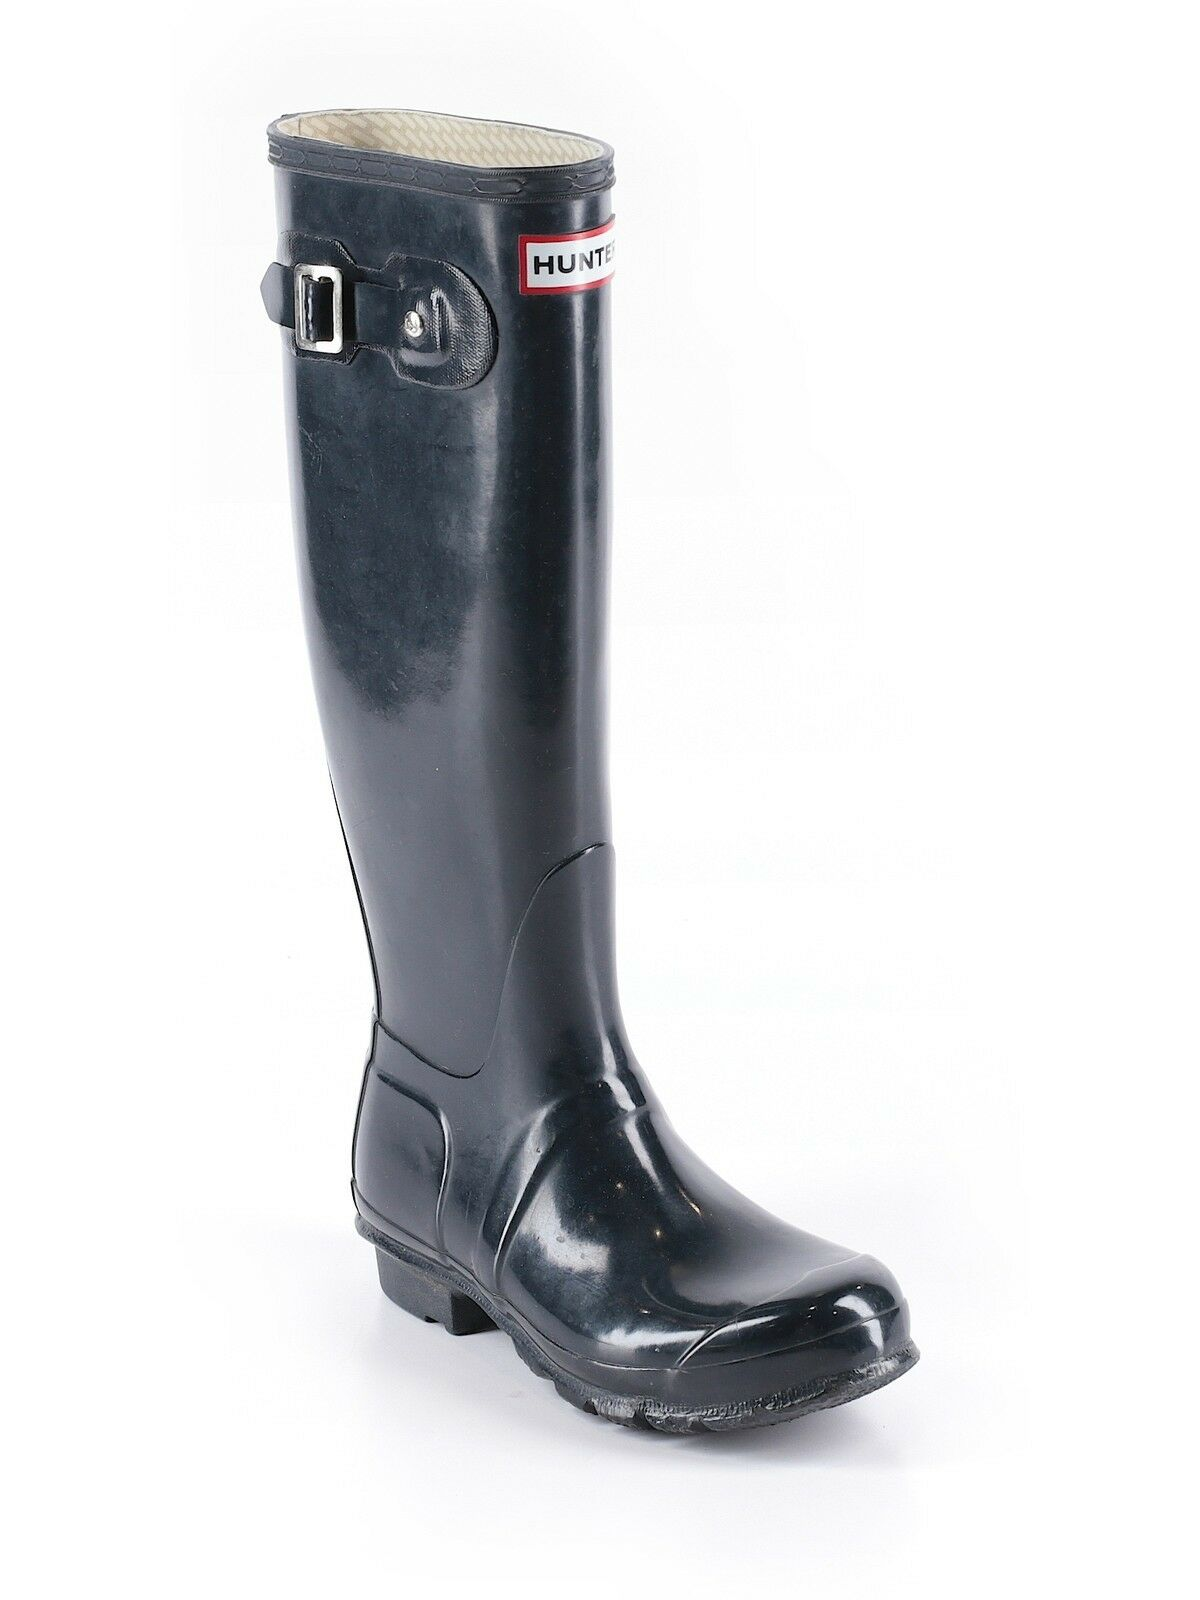 Damens Navy Blau Rain Original Gloss Tall Hunter Rain Blau Stiefel Wellies Größe 5 36 fb1589